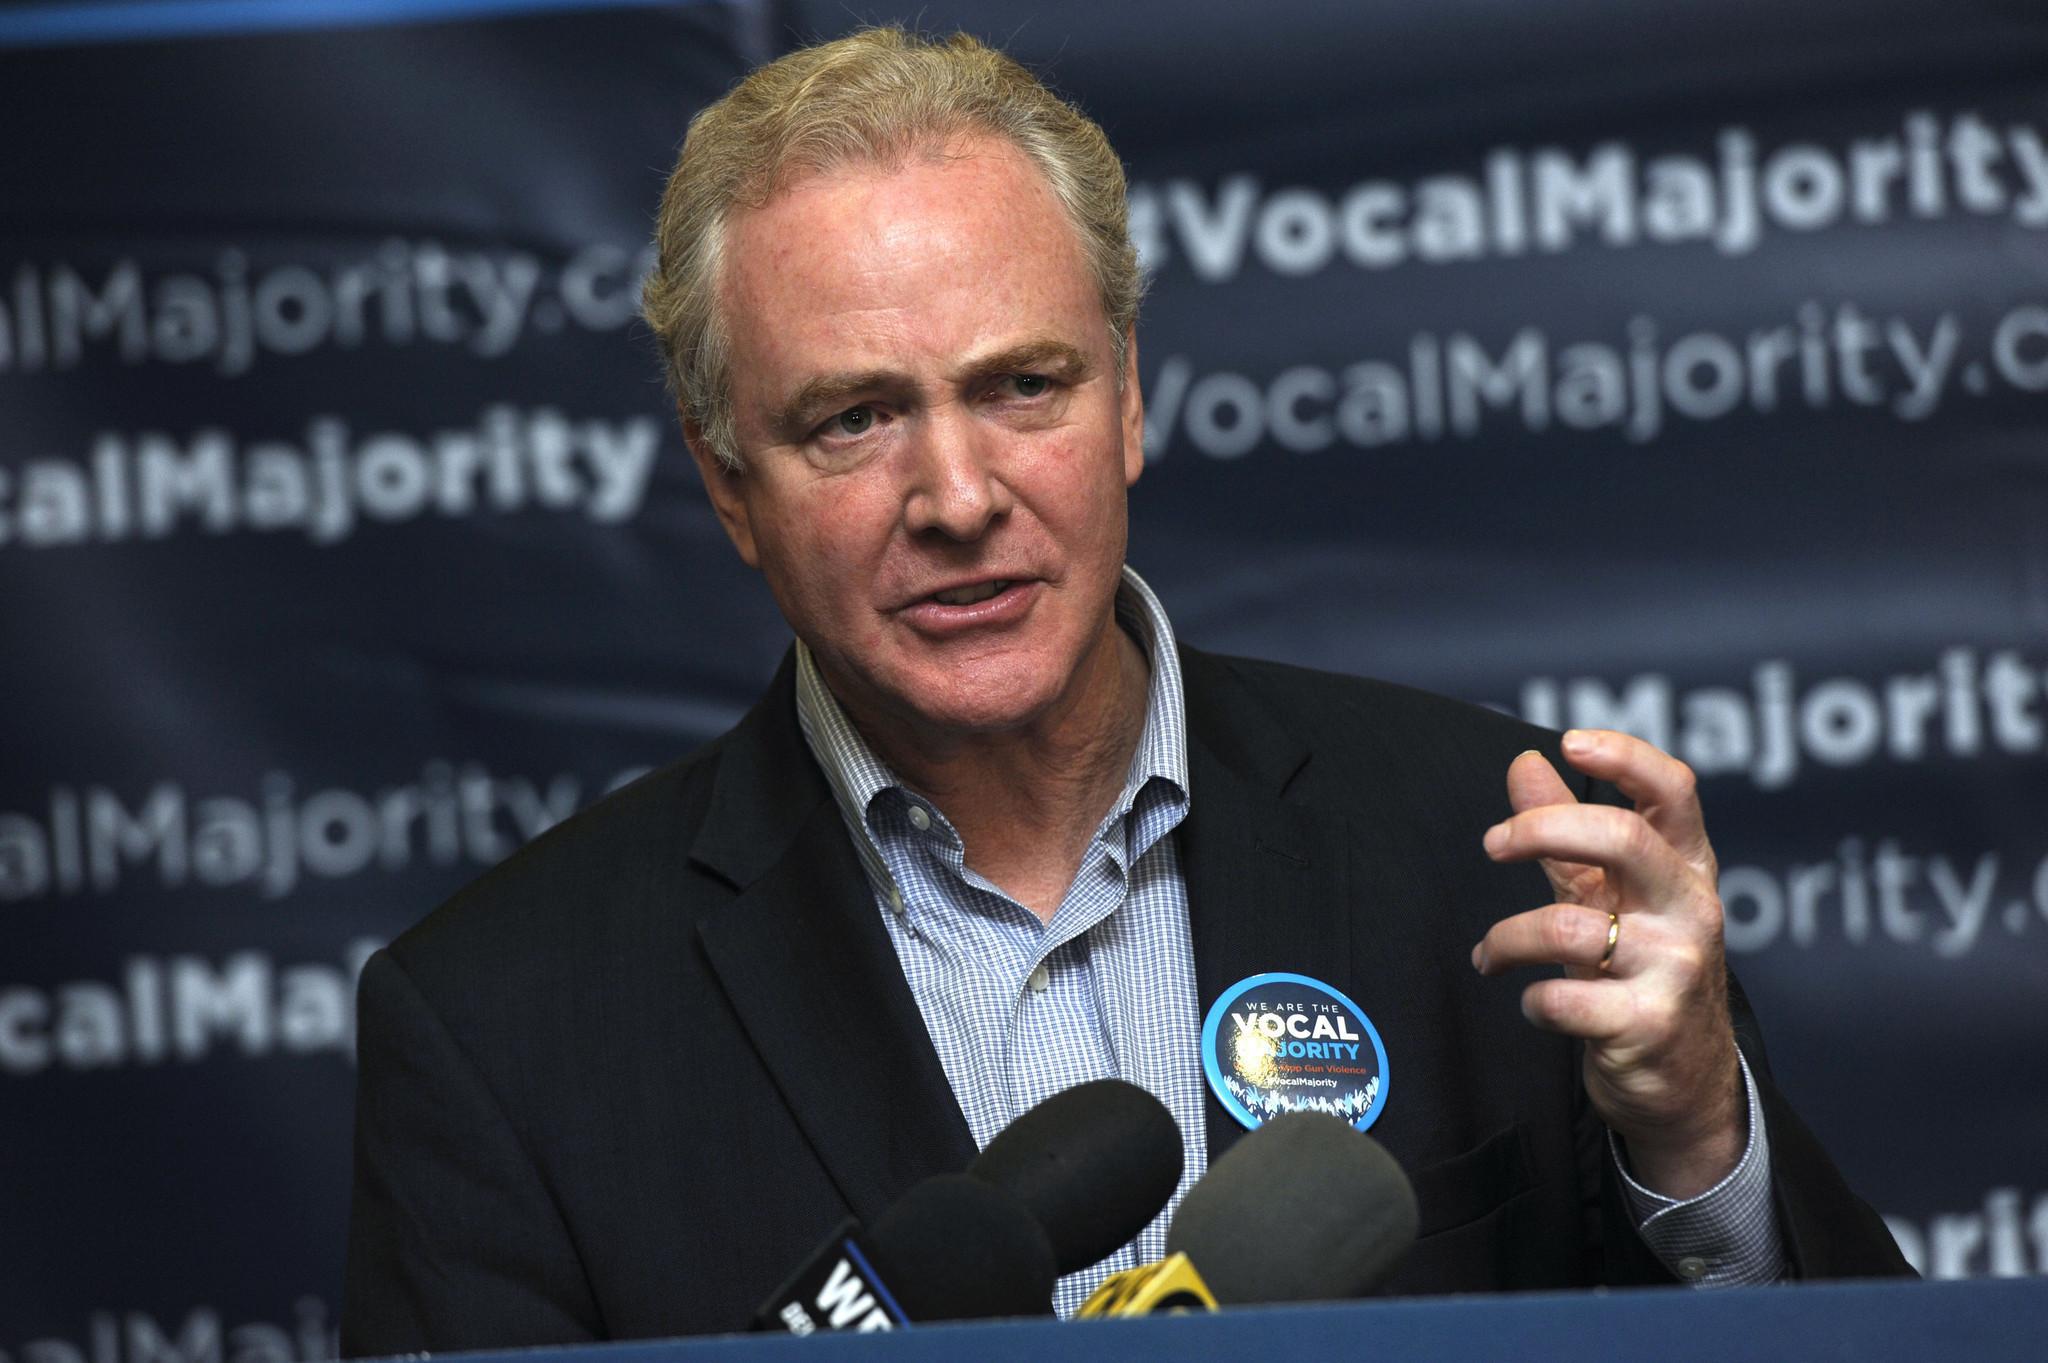 Van Hollen Cuts His Own Path In Race For Senate